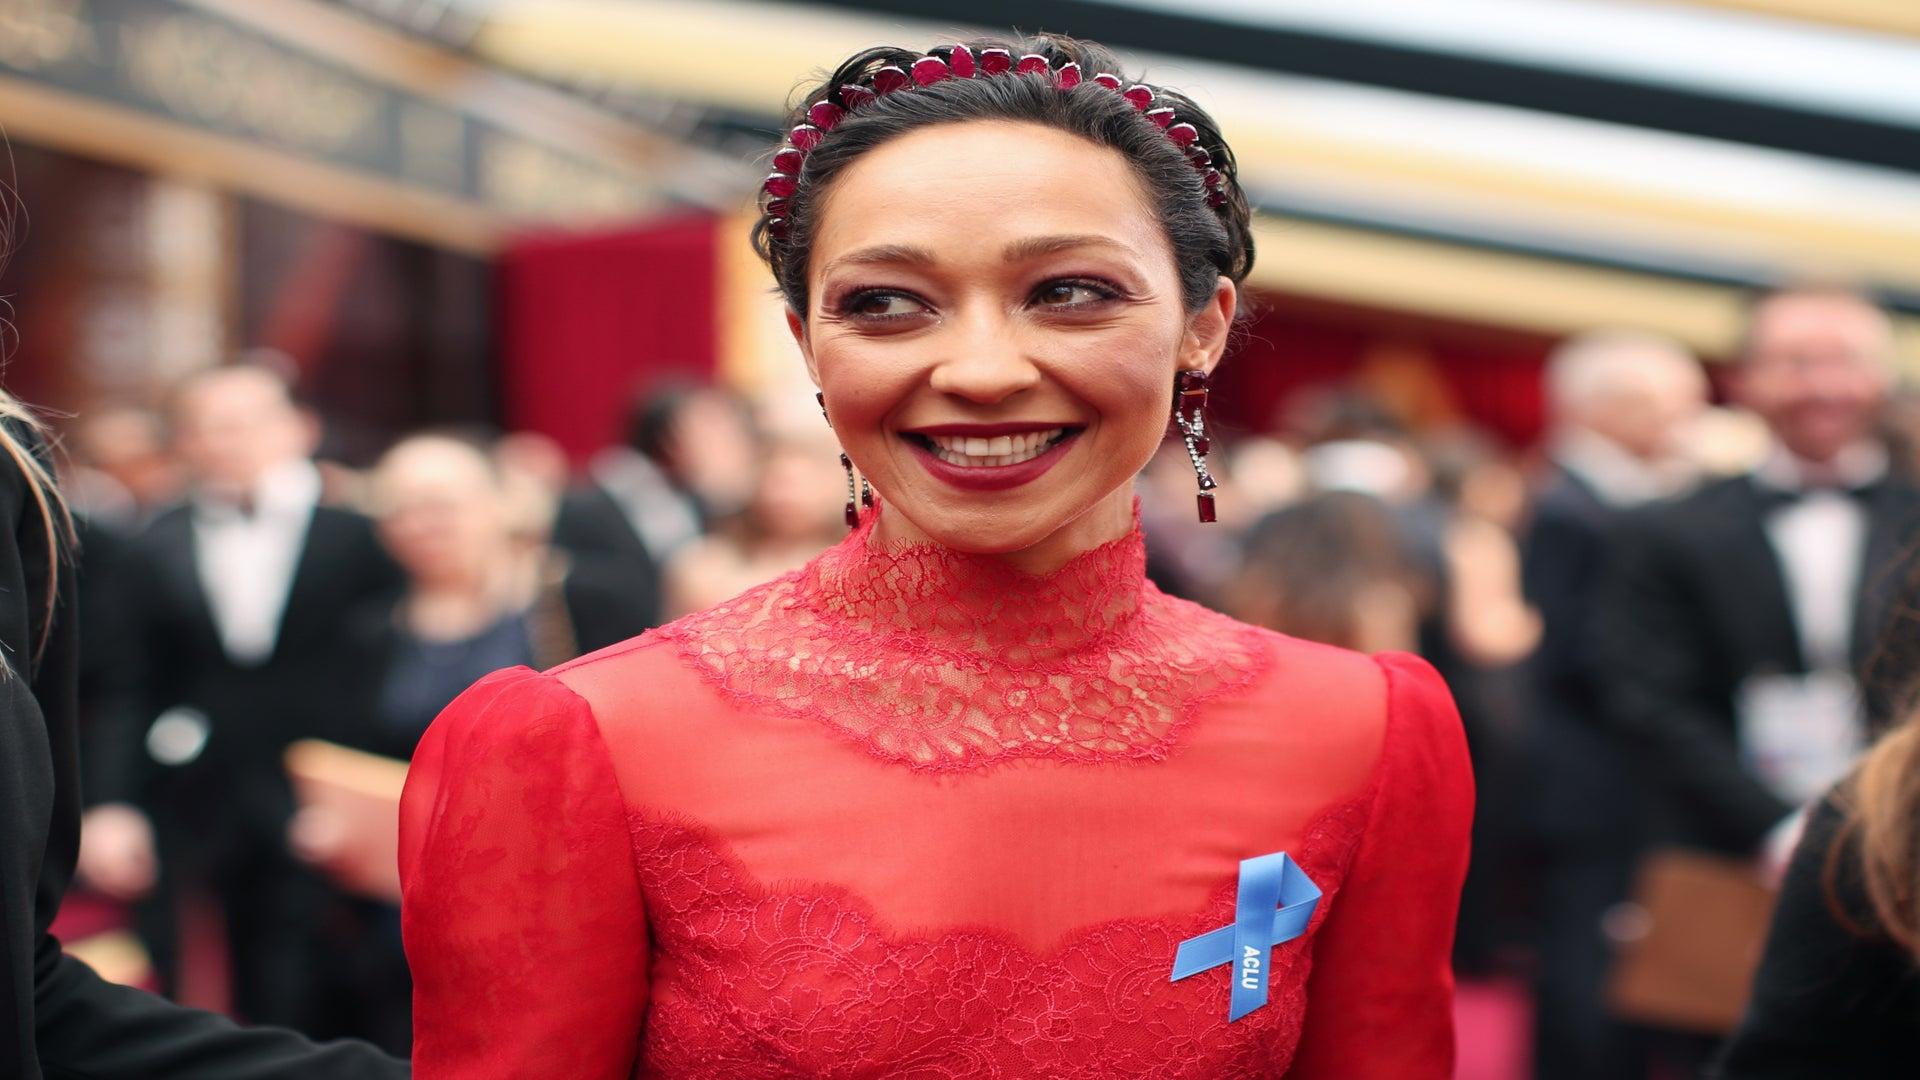 Ruth Negga Lights Up 2017 Oscars Red Carpet in Valentino